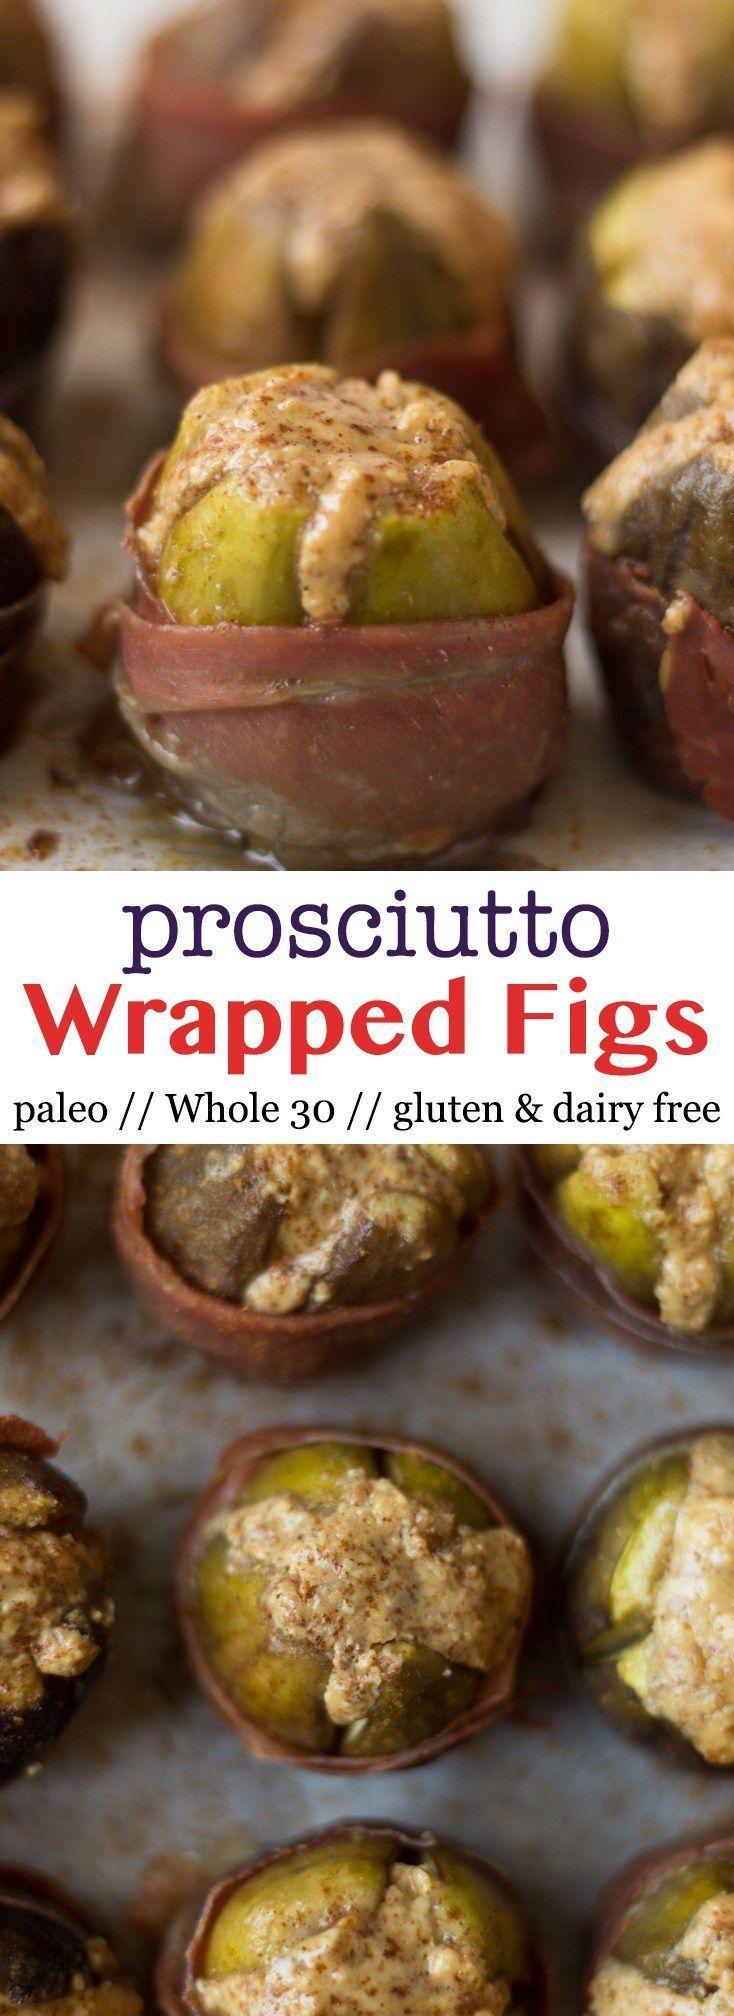 463 best Best Appetizer Recipes images on Pinterest   Appetizer ...